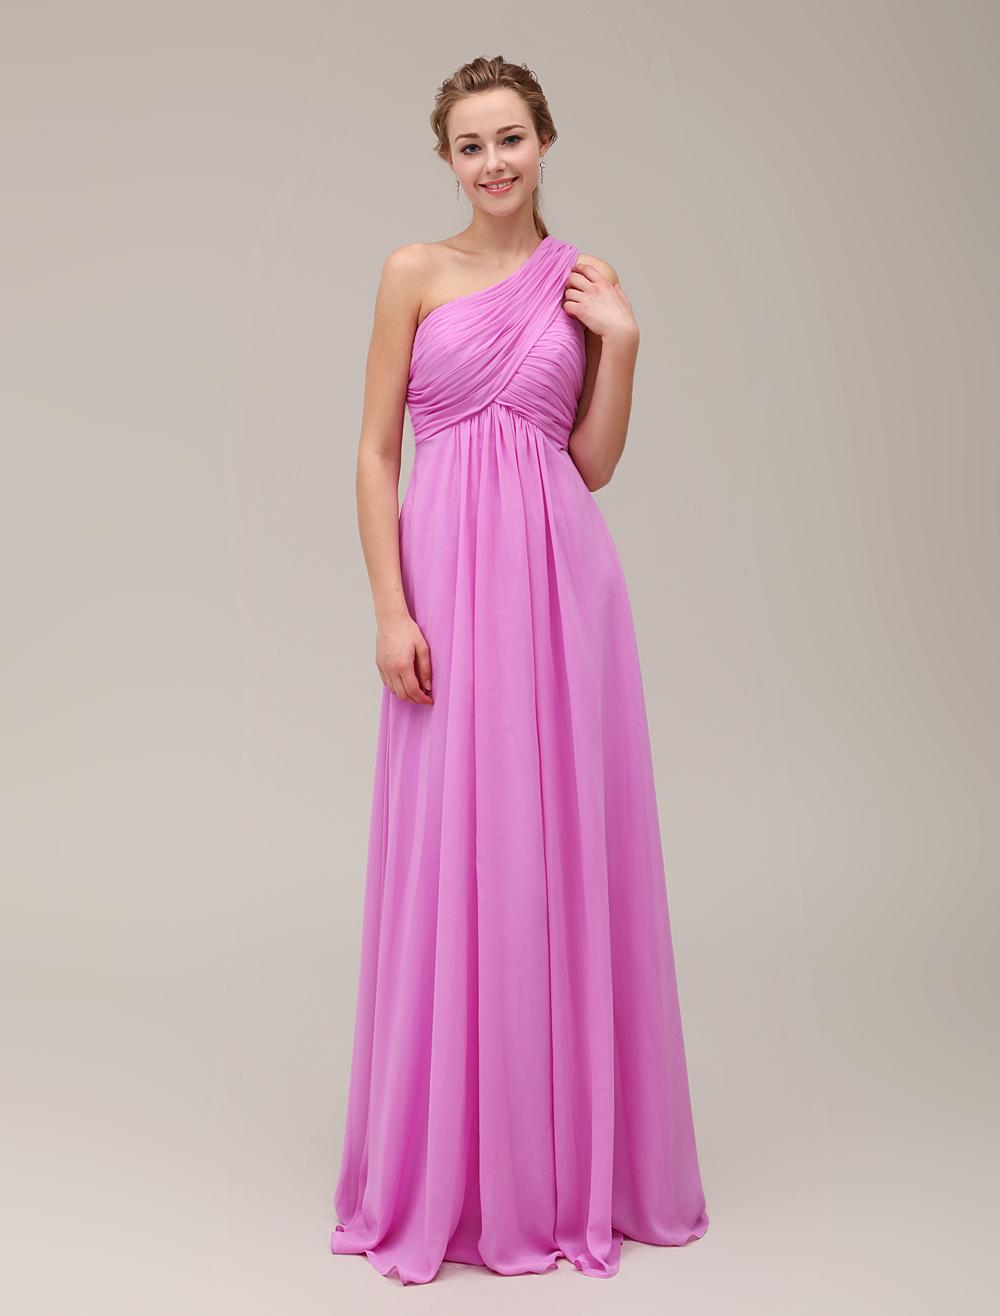 Fuchsia Pink Maternity Bridesmaid Dress One Shoulder Pleated Floor Length Chiffon Wedding Party Dress Milanoo photo